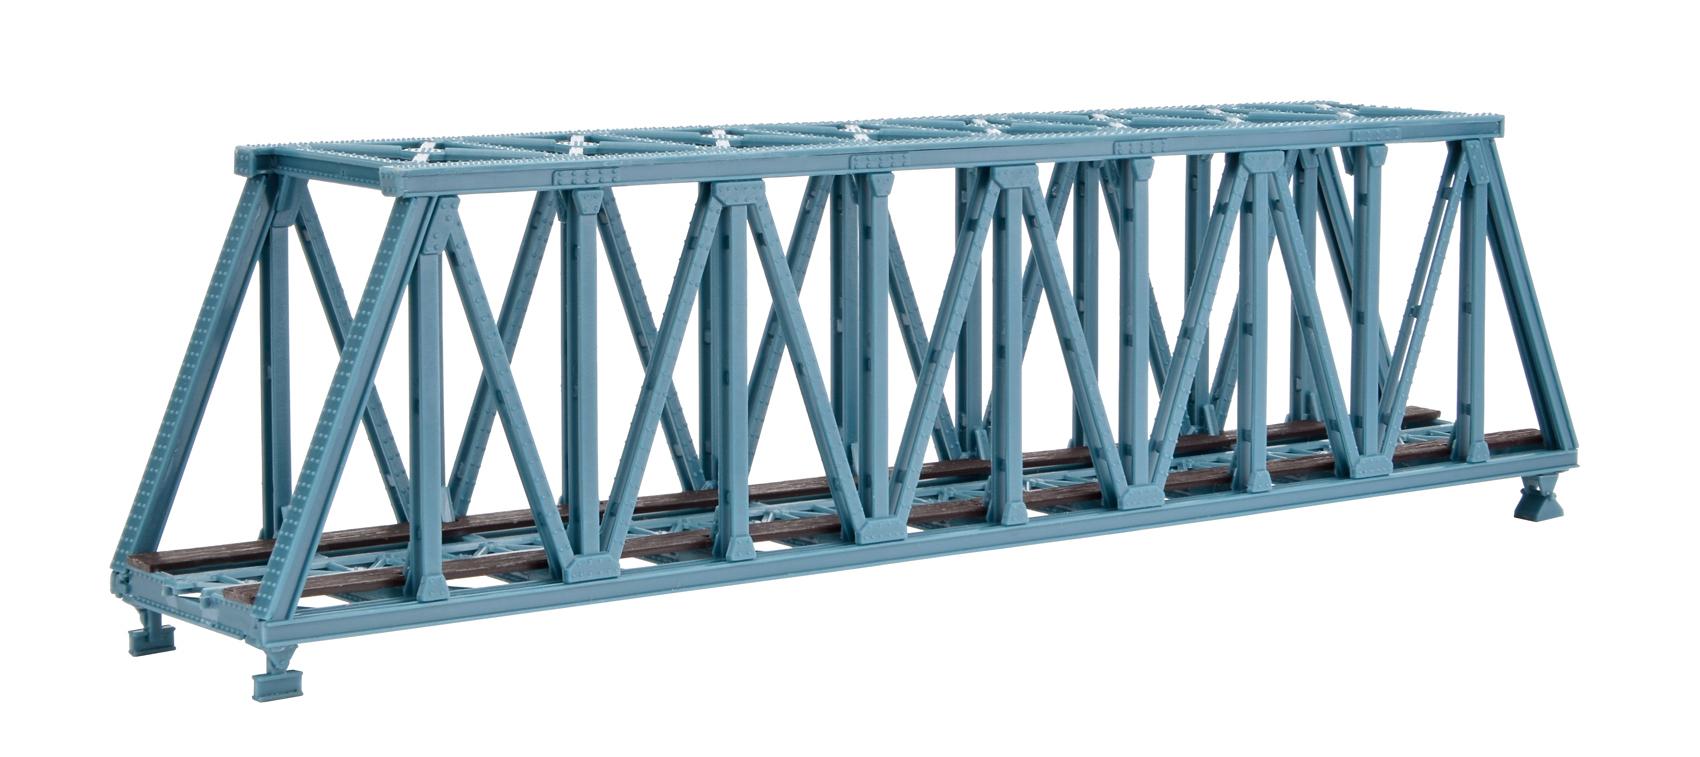 Vollmer 47801 <br/>Brücke, Stahlbrücke, Kasten-Brücke, gerade